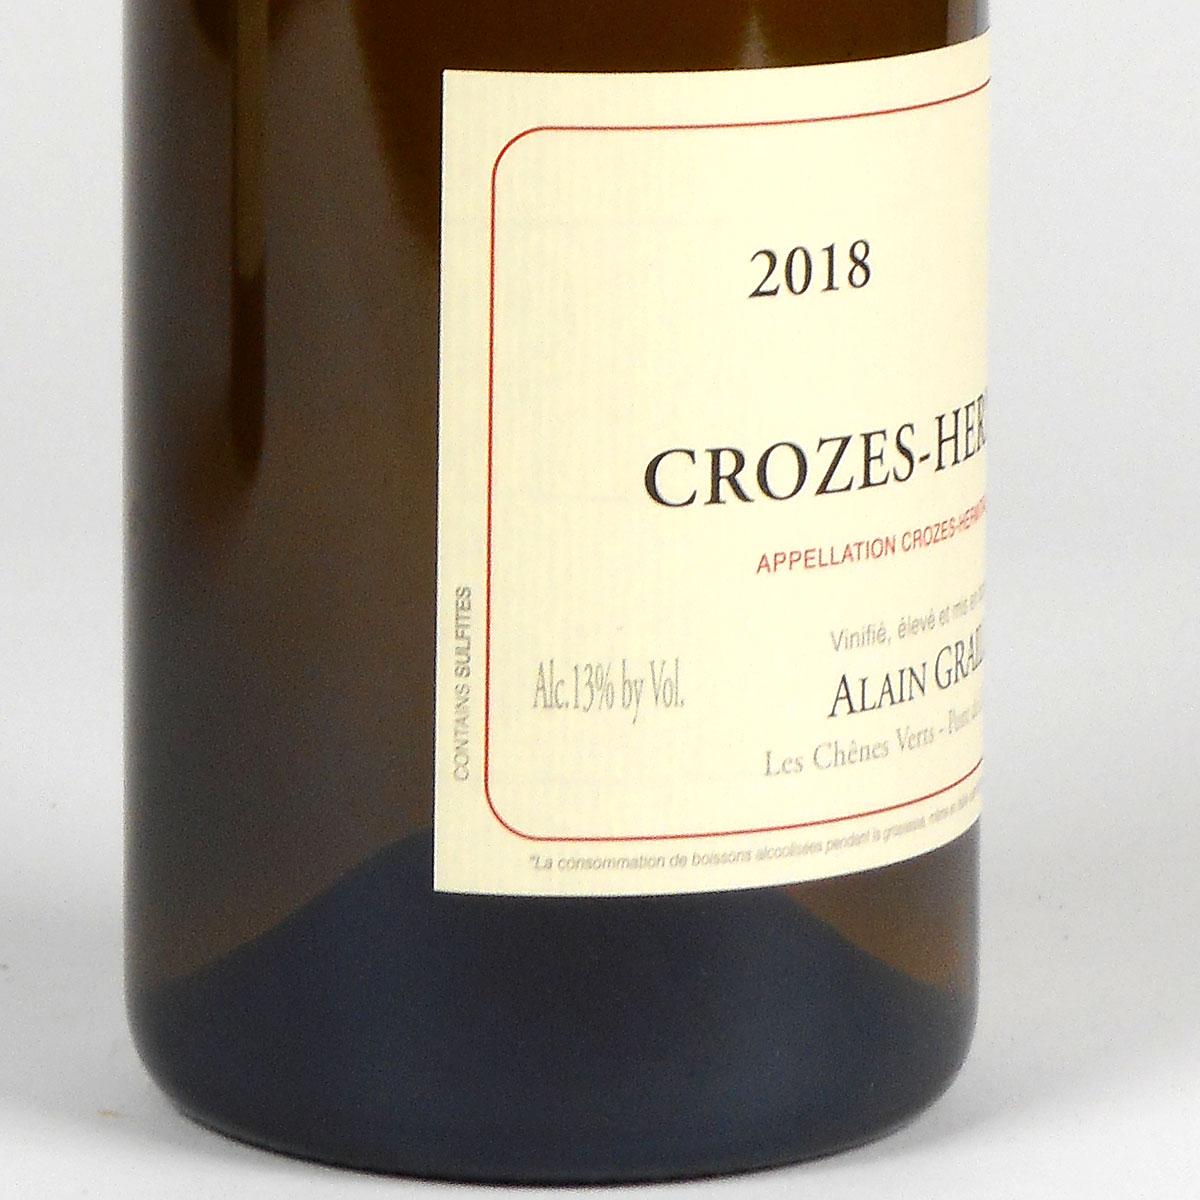 Crozes Hermitage Blanc: Alain Graillot 2018 - Bottle Side Label